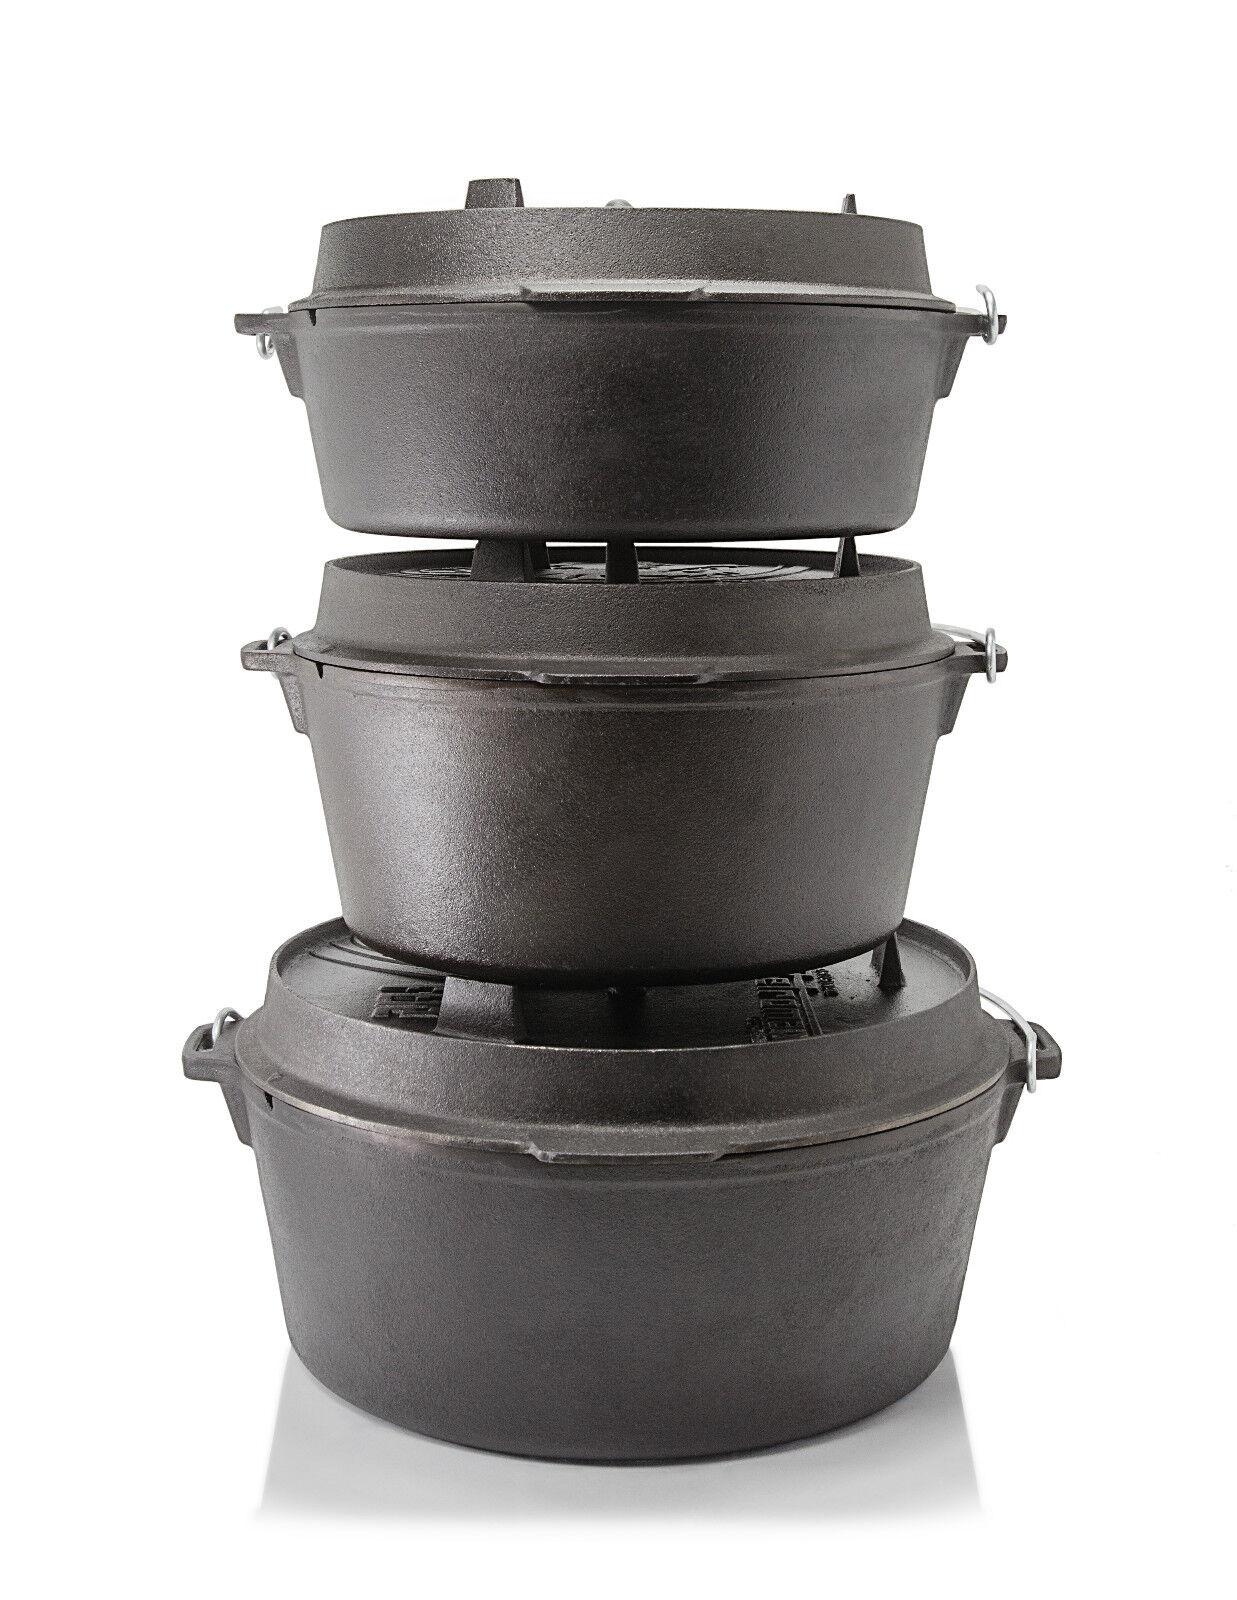 Petromax fuego olla Dutch Oven hierro fundido olla - 2,3 - 14,7 litros sin pies